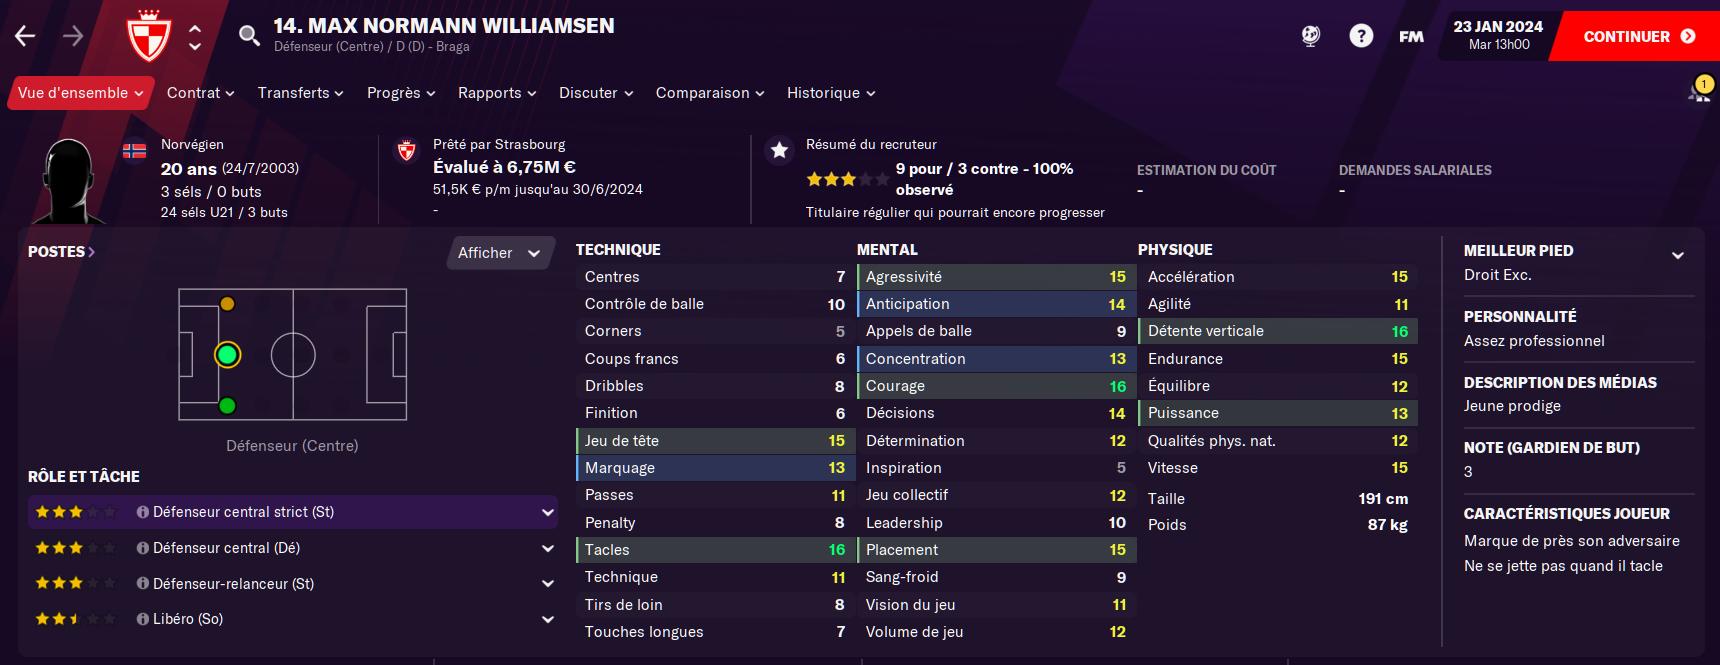 Nos meilleures pépites sur Football Manager 2021